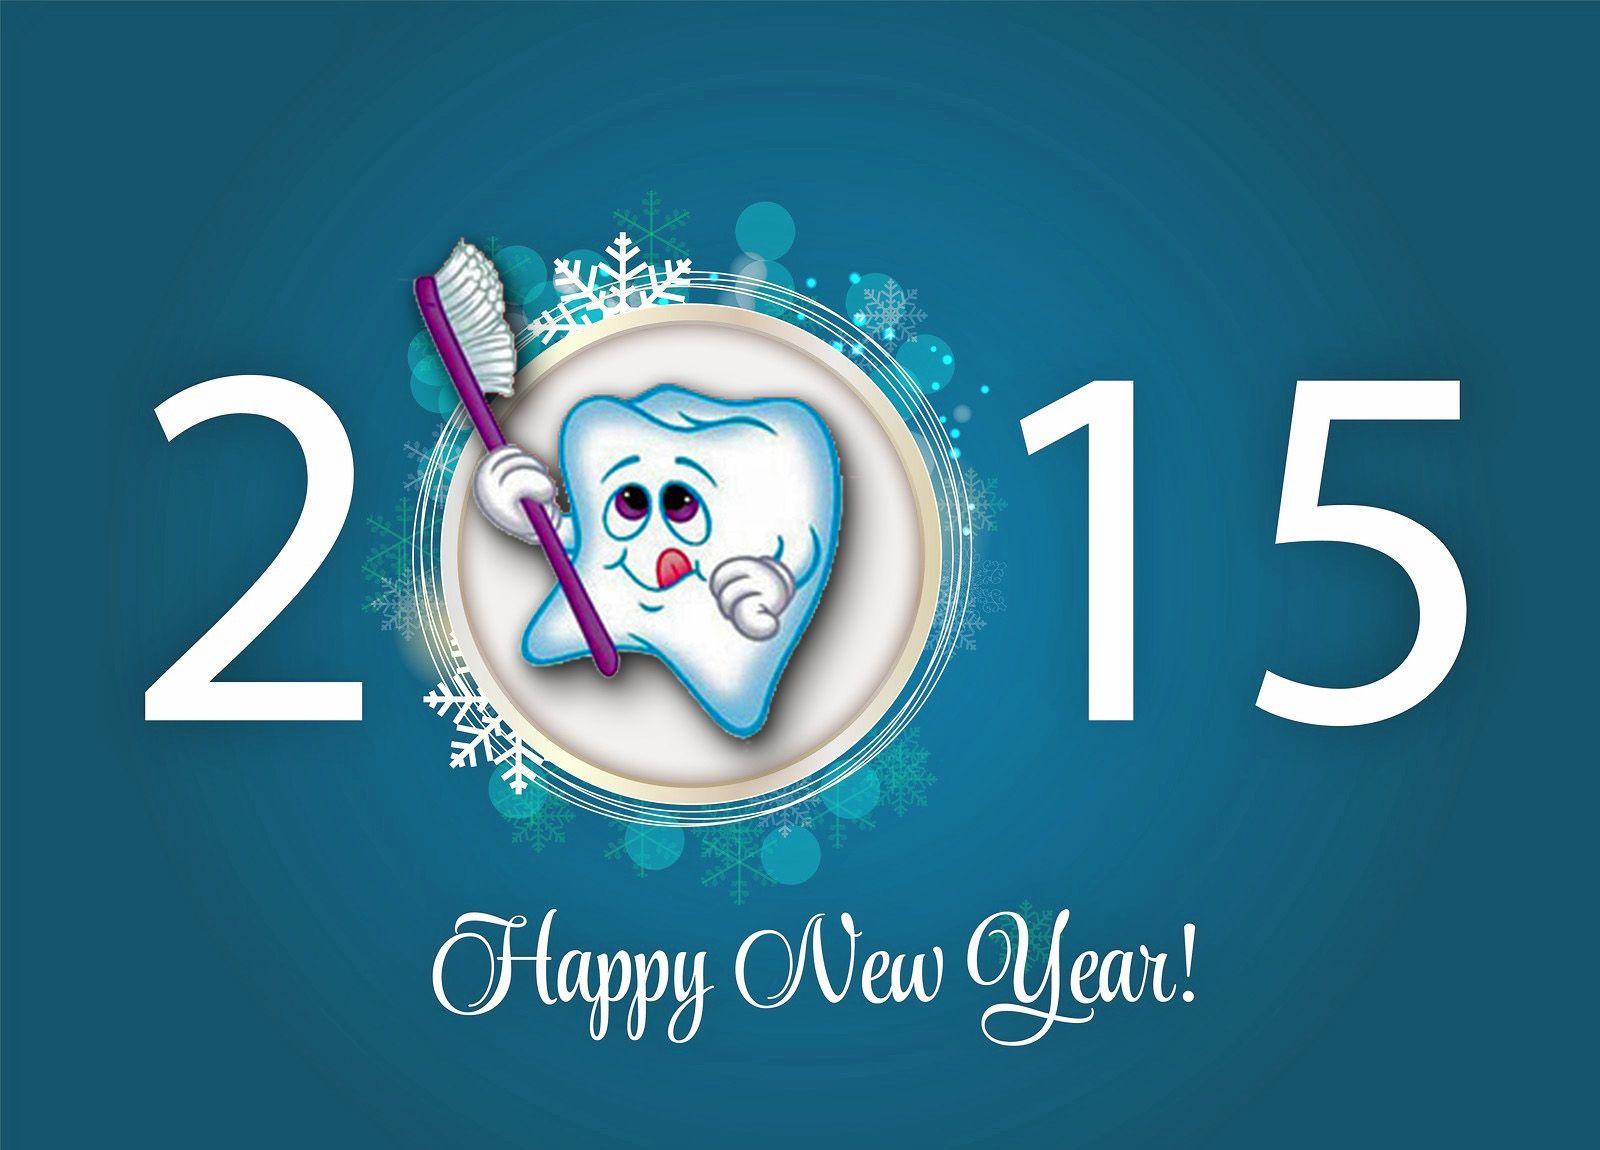 HappyNewYear from Fairfield Dental Associates! http